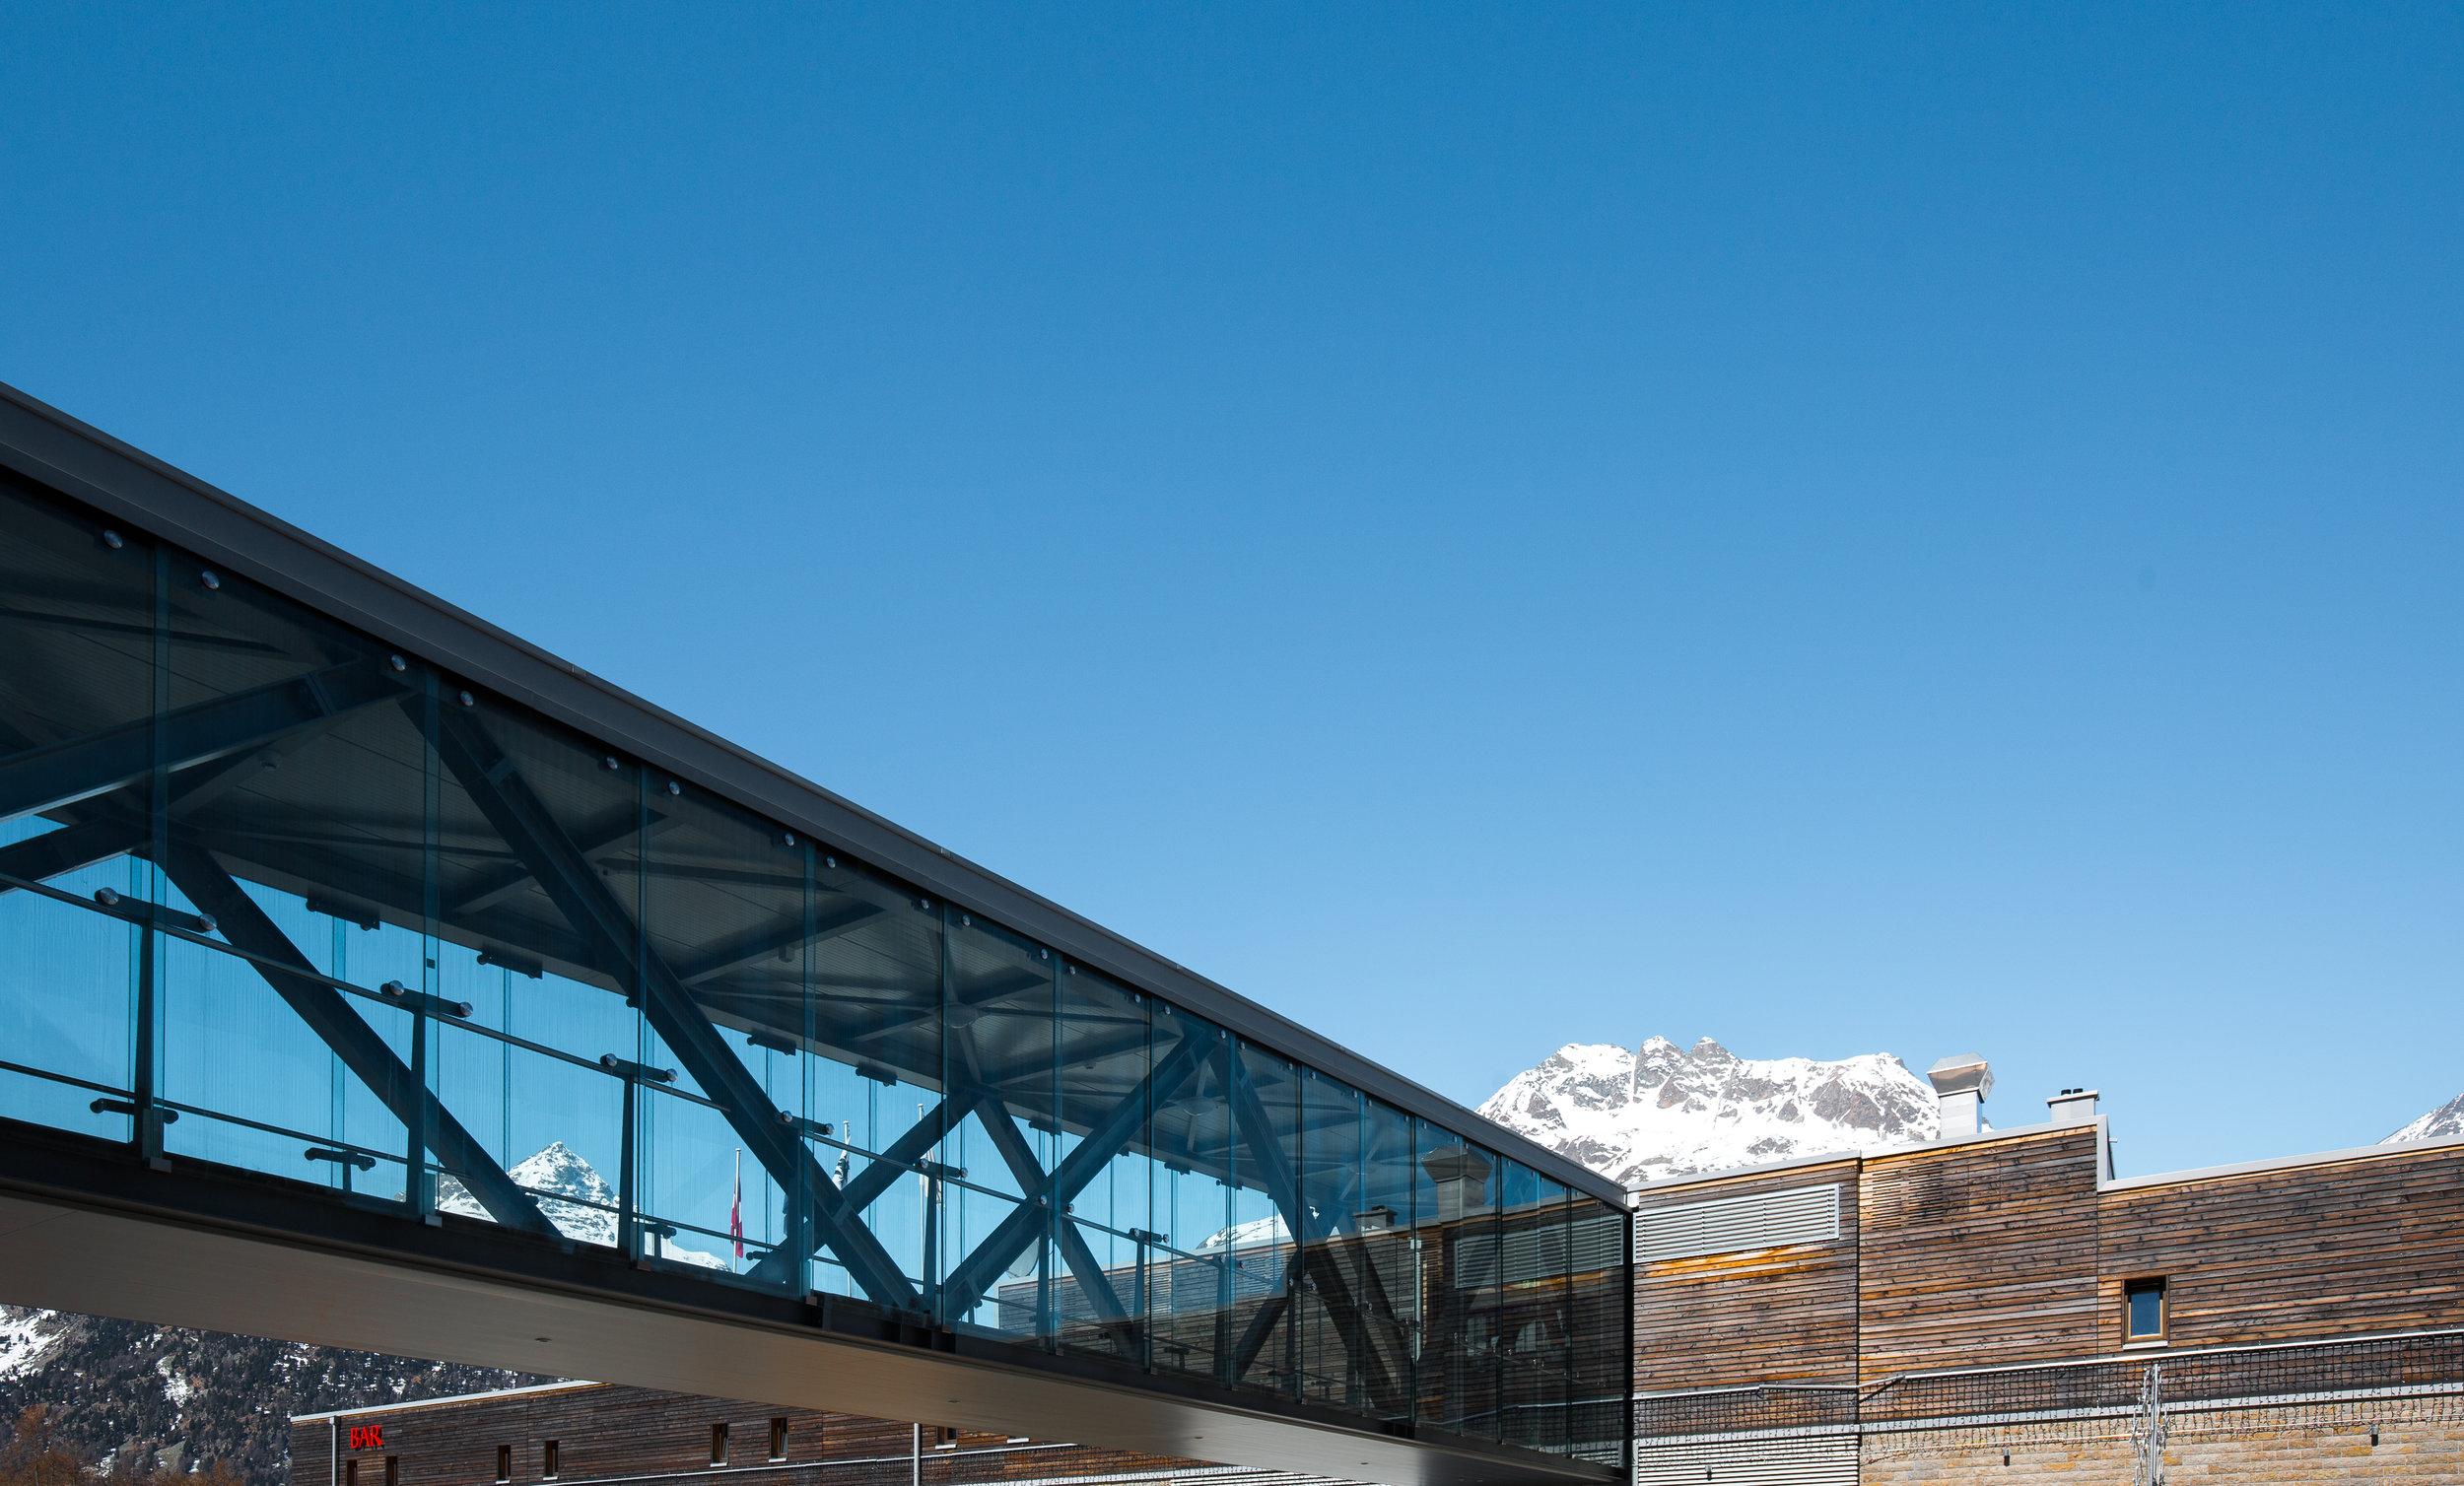 nira alpina-0801.jpg